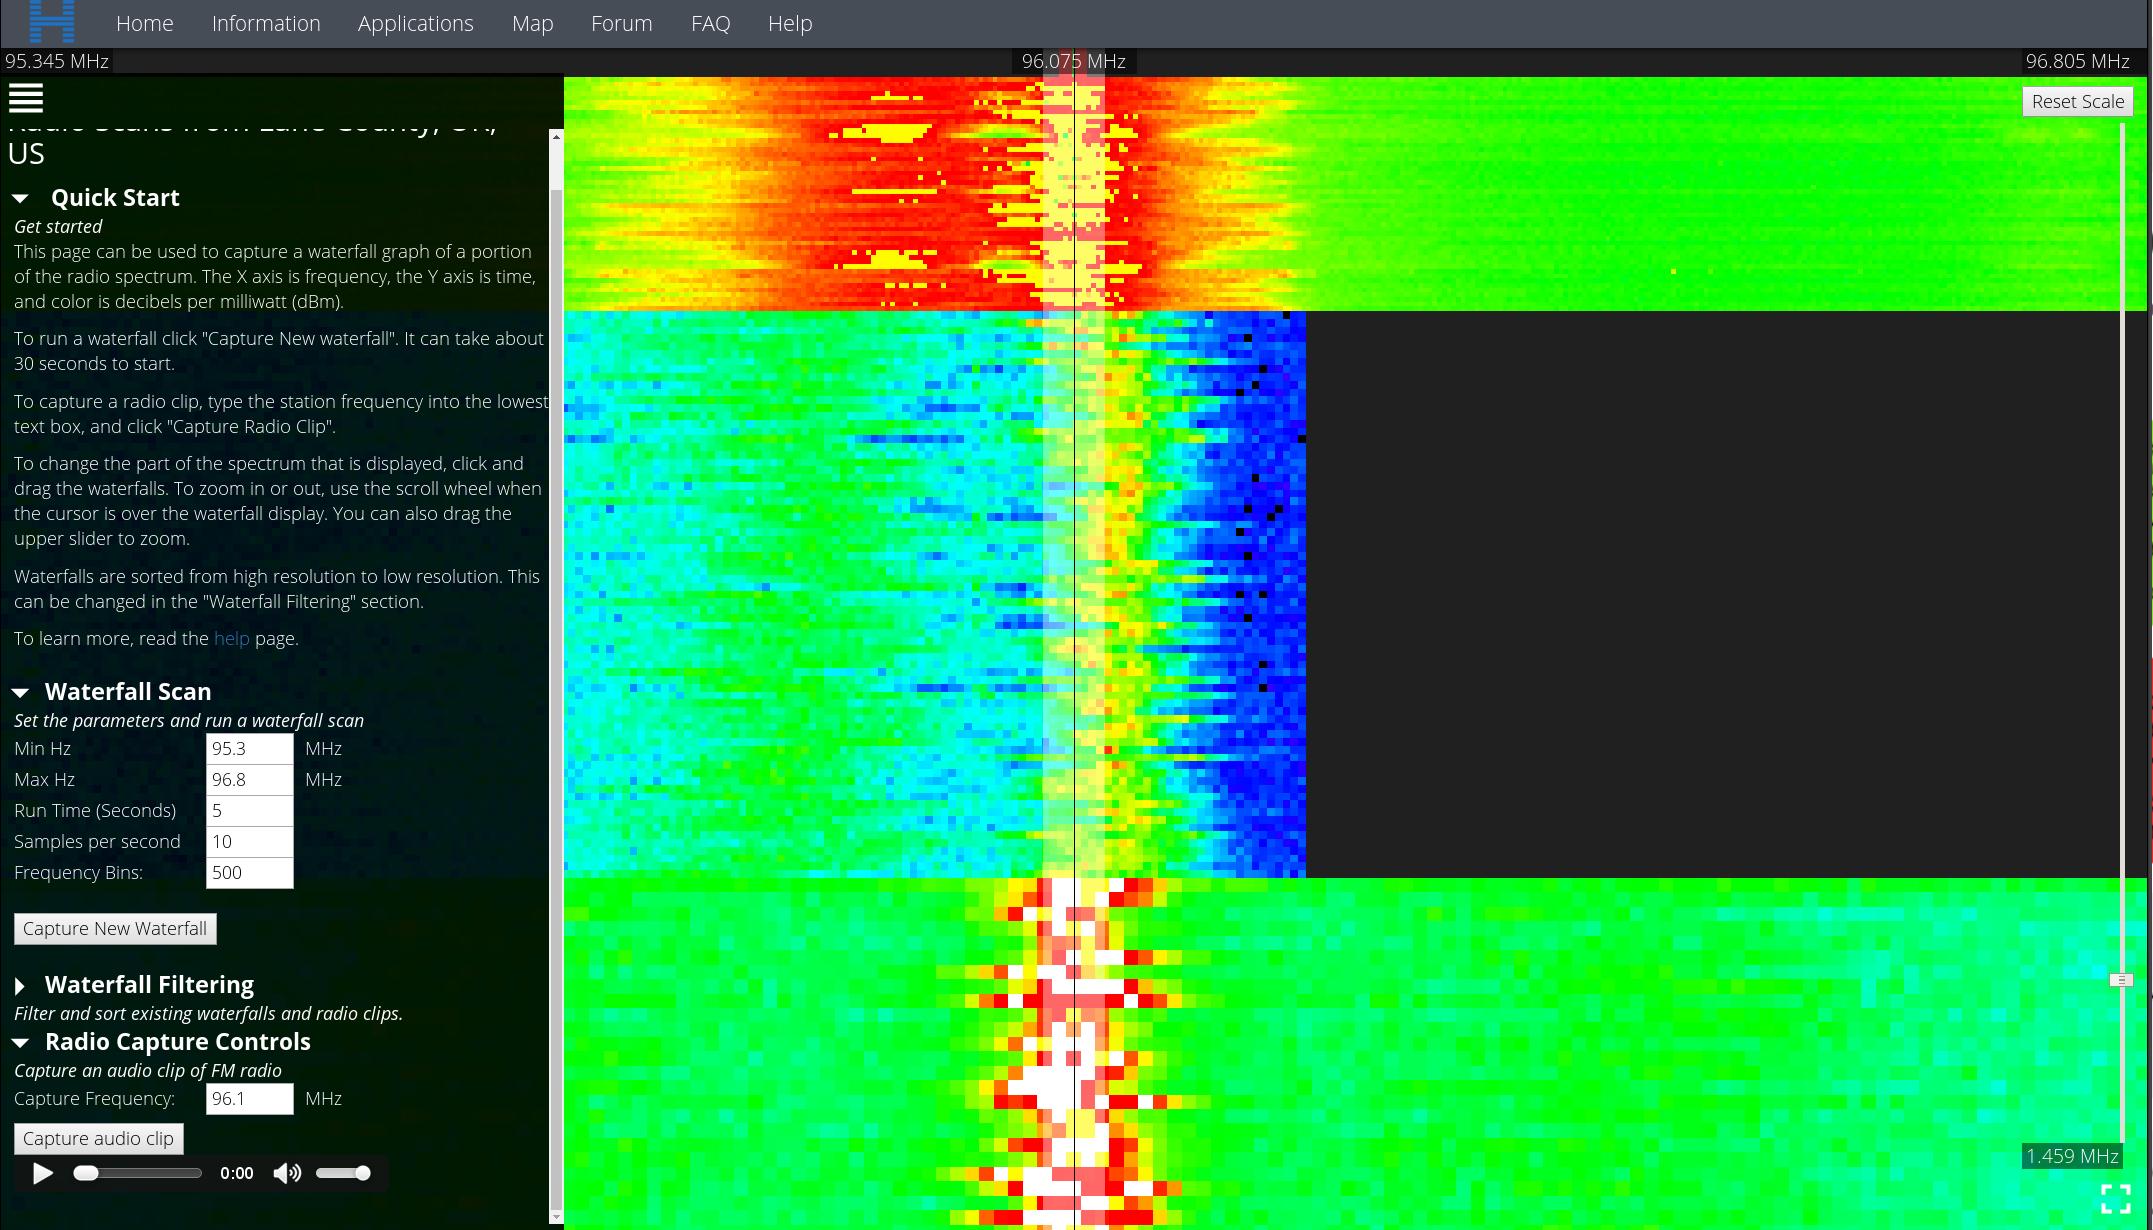 PoC1 Network Speed Test